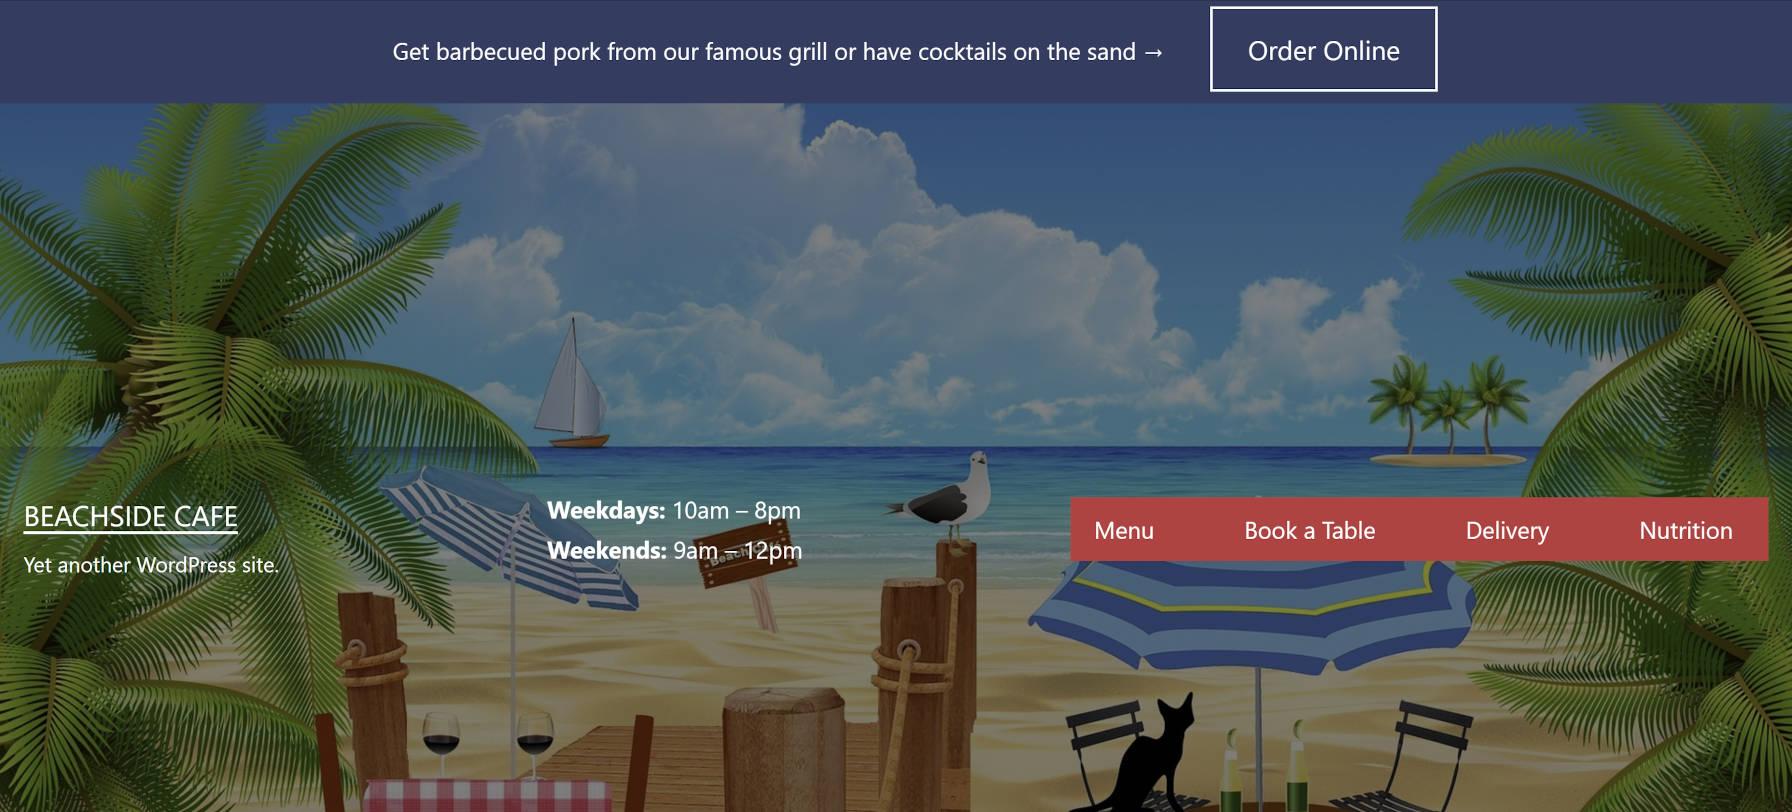 Custom restaurant header design for a beachside cafe.